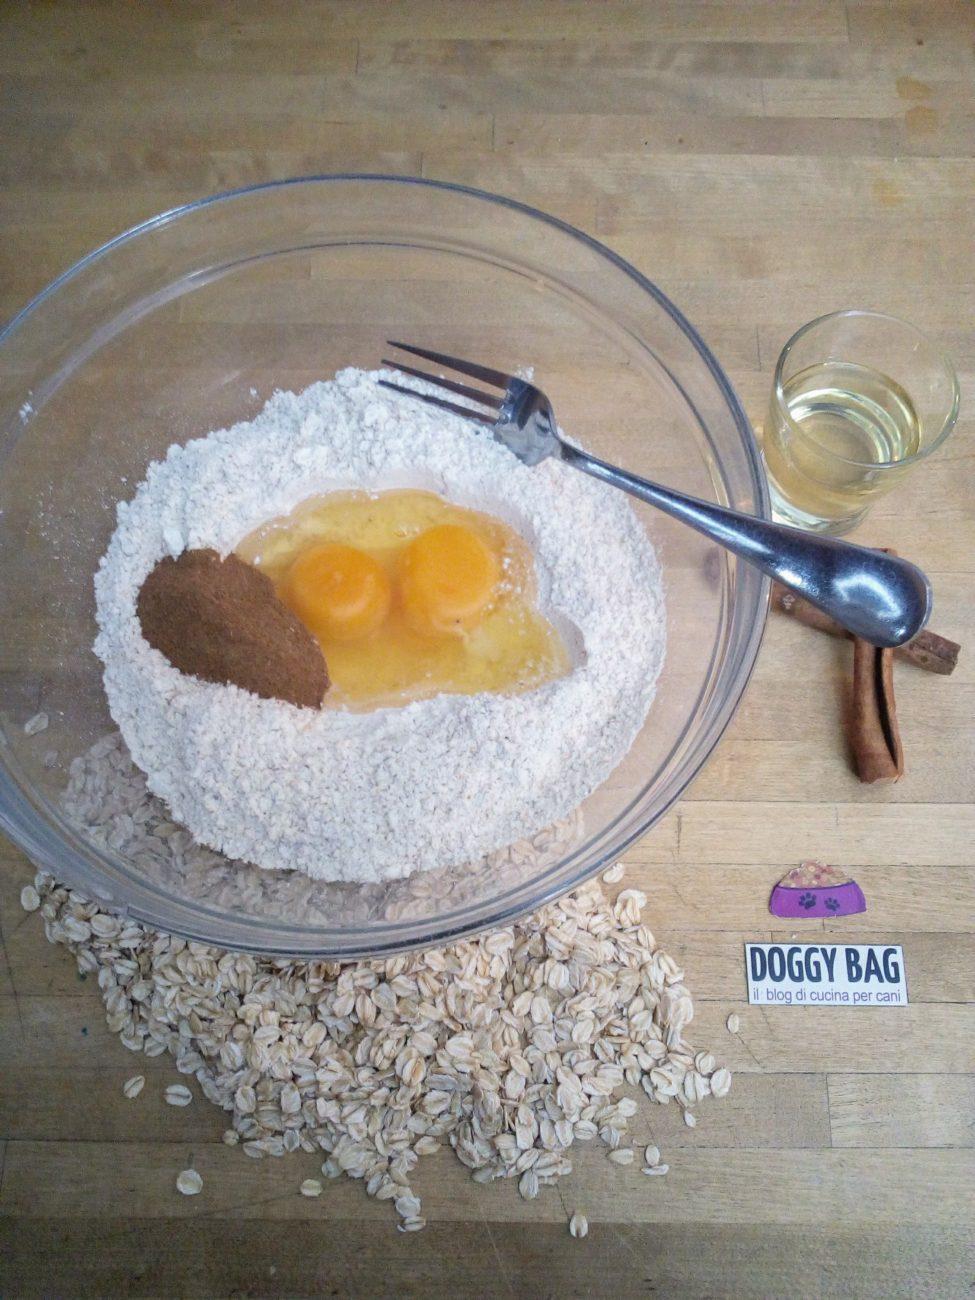 Snack per cani cannella carote mela doggy bag il blog di cucina per cani - Cucina casalinga per cani dosi ...